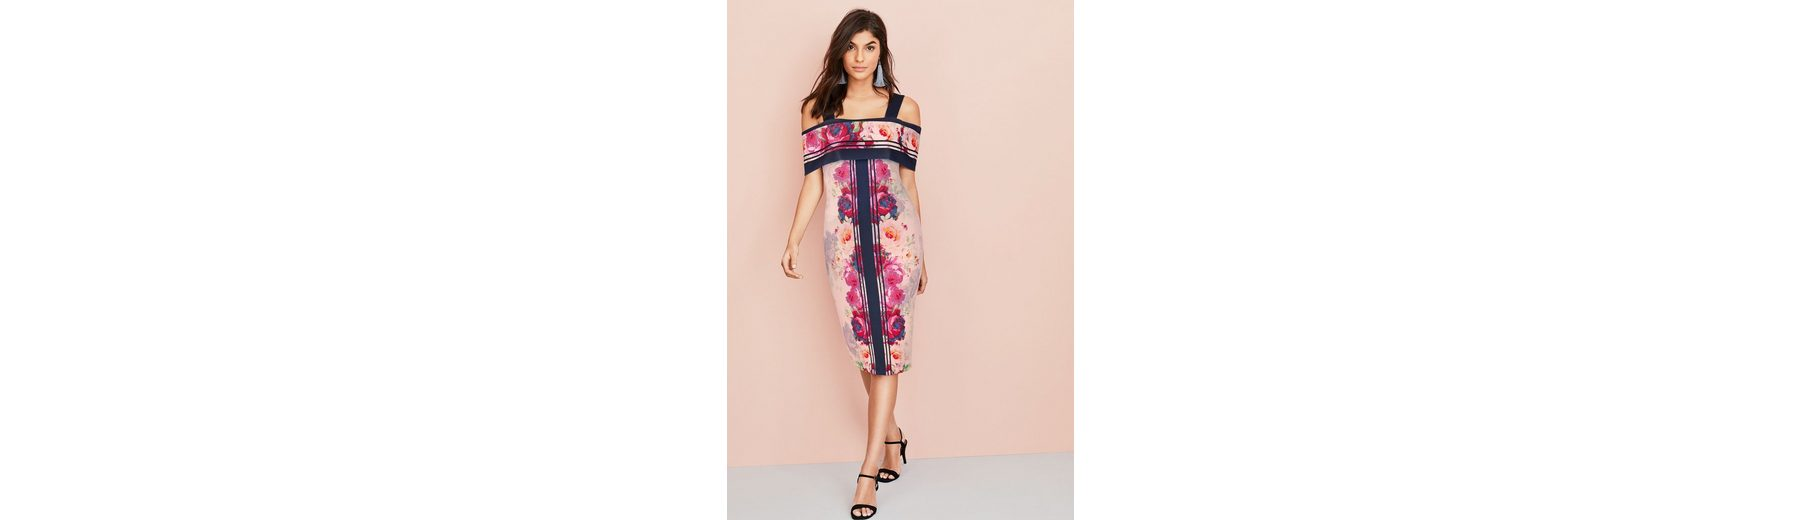 Auslass Extrem Footlocker Verkauf Online Next Figurbetontes Bardot-Kleid Billig Empfehlen QJOl1